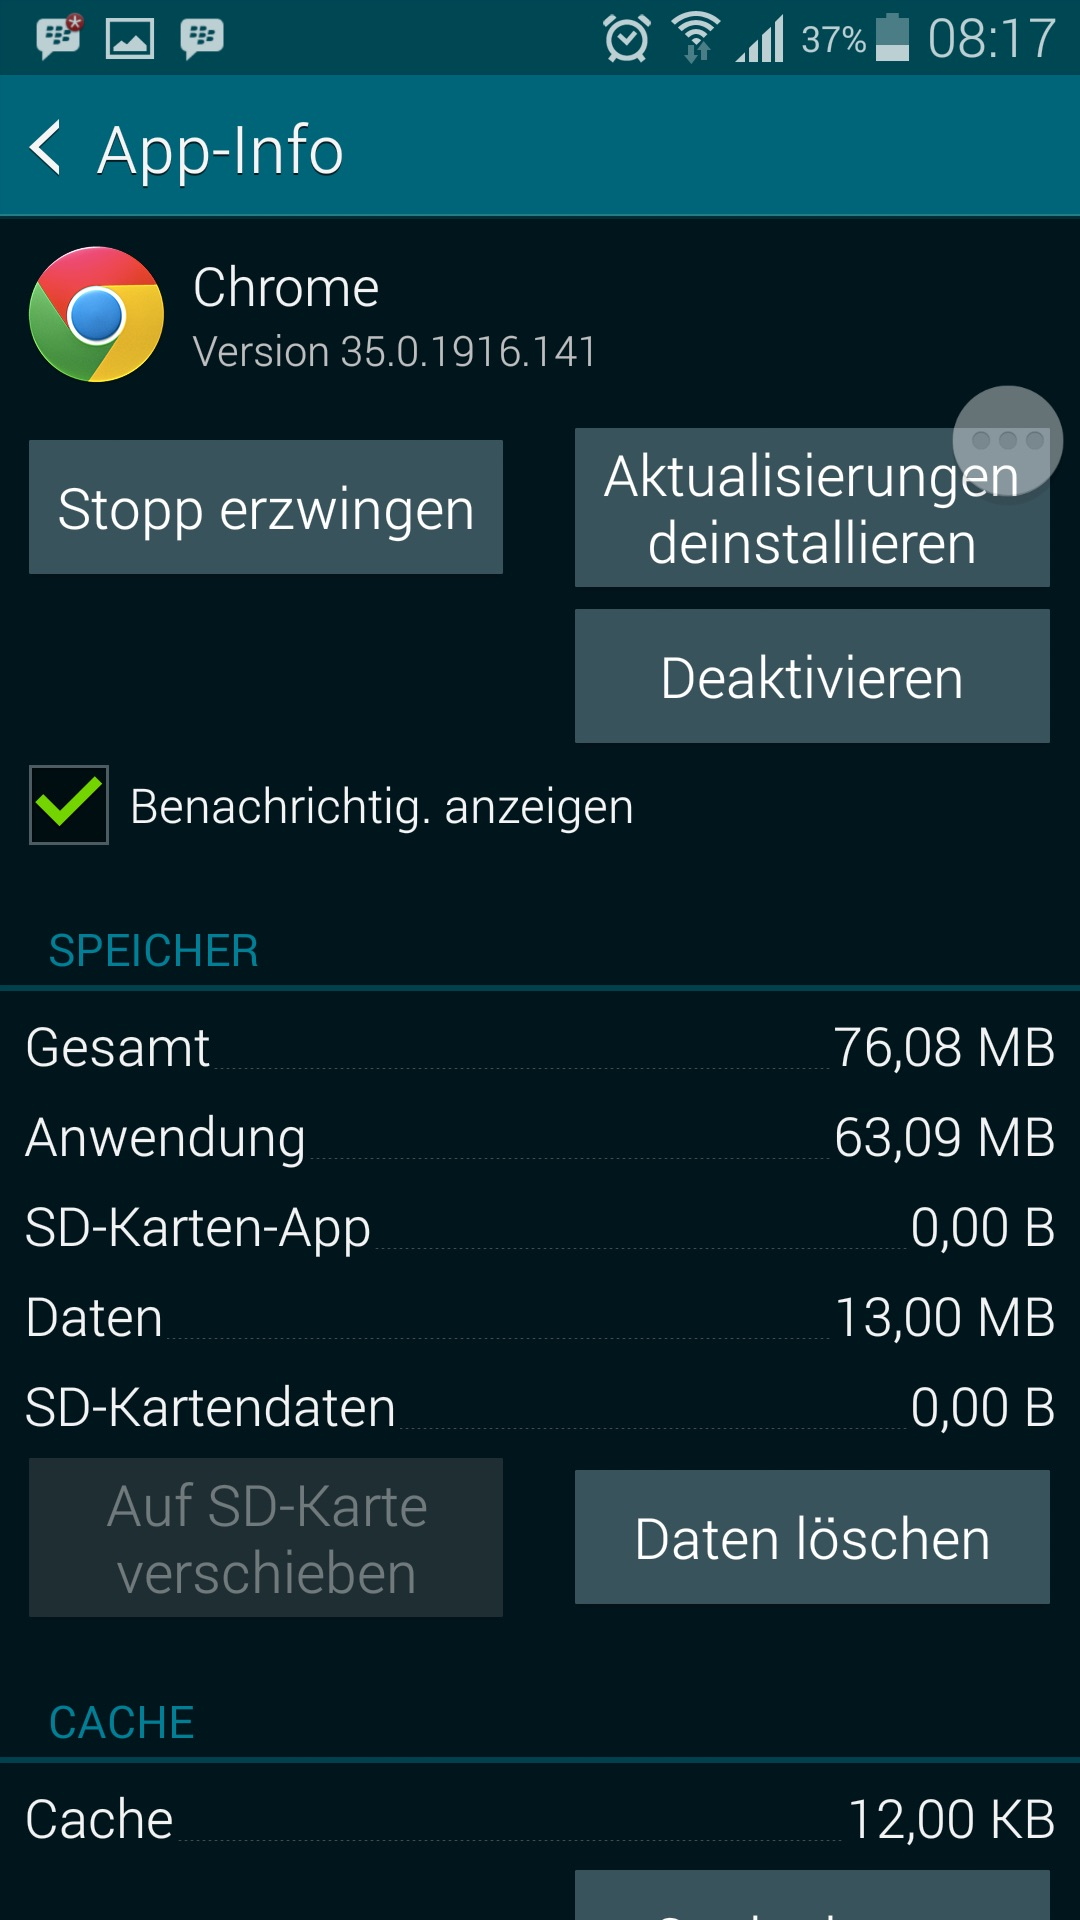 App Info - Stopp erzwingen